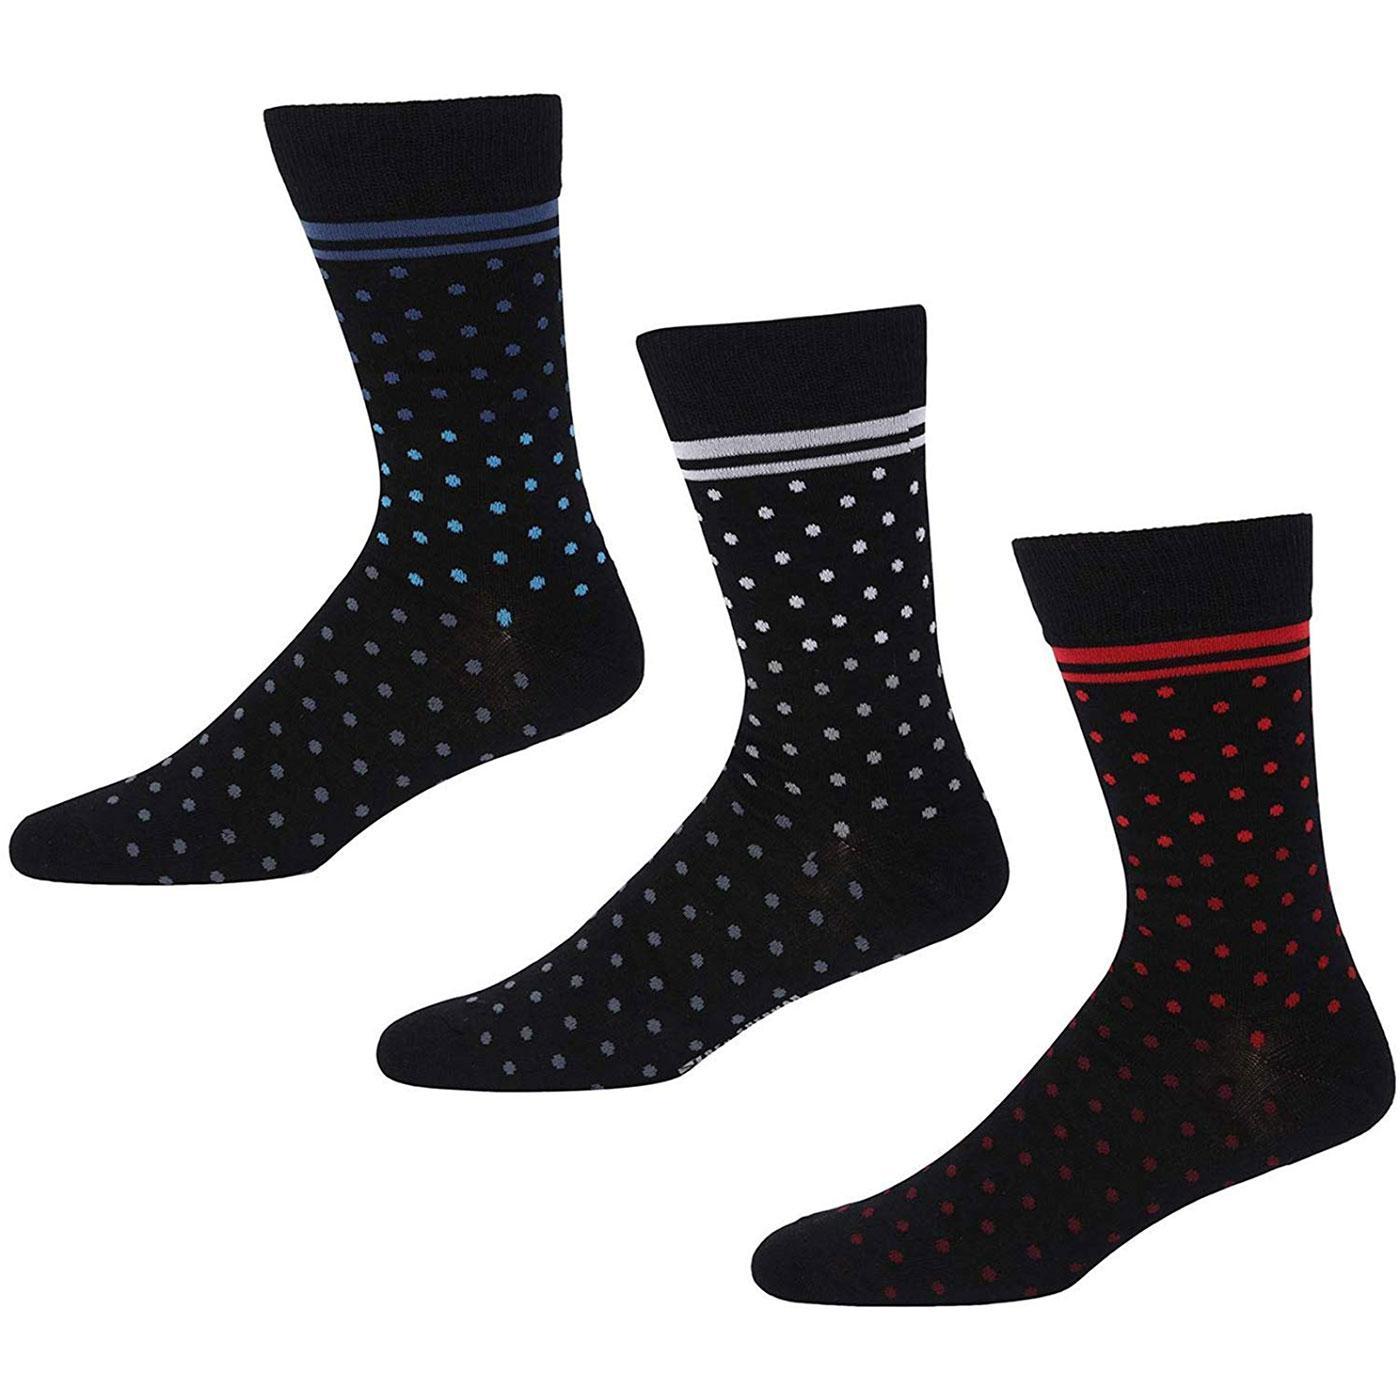 Arkle BEN SHERMAN Spots & Stripes 3 Pack Socks (B)